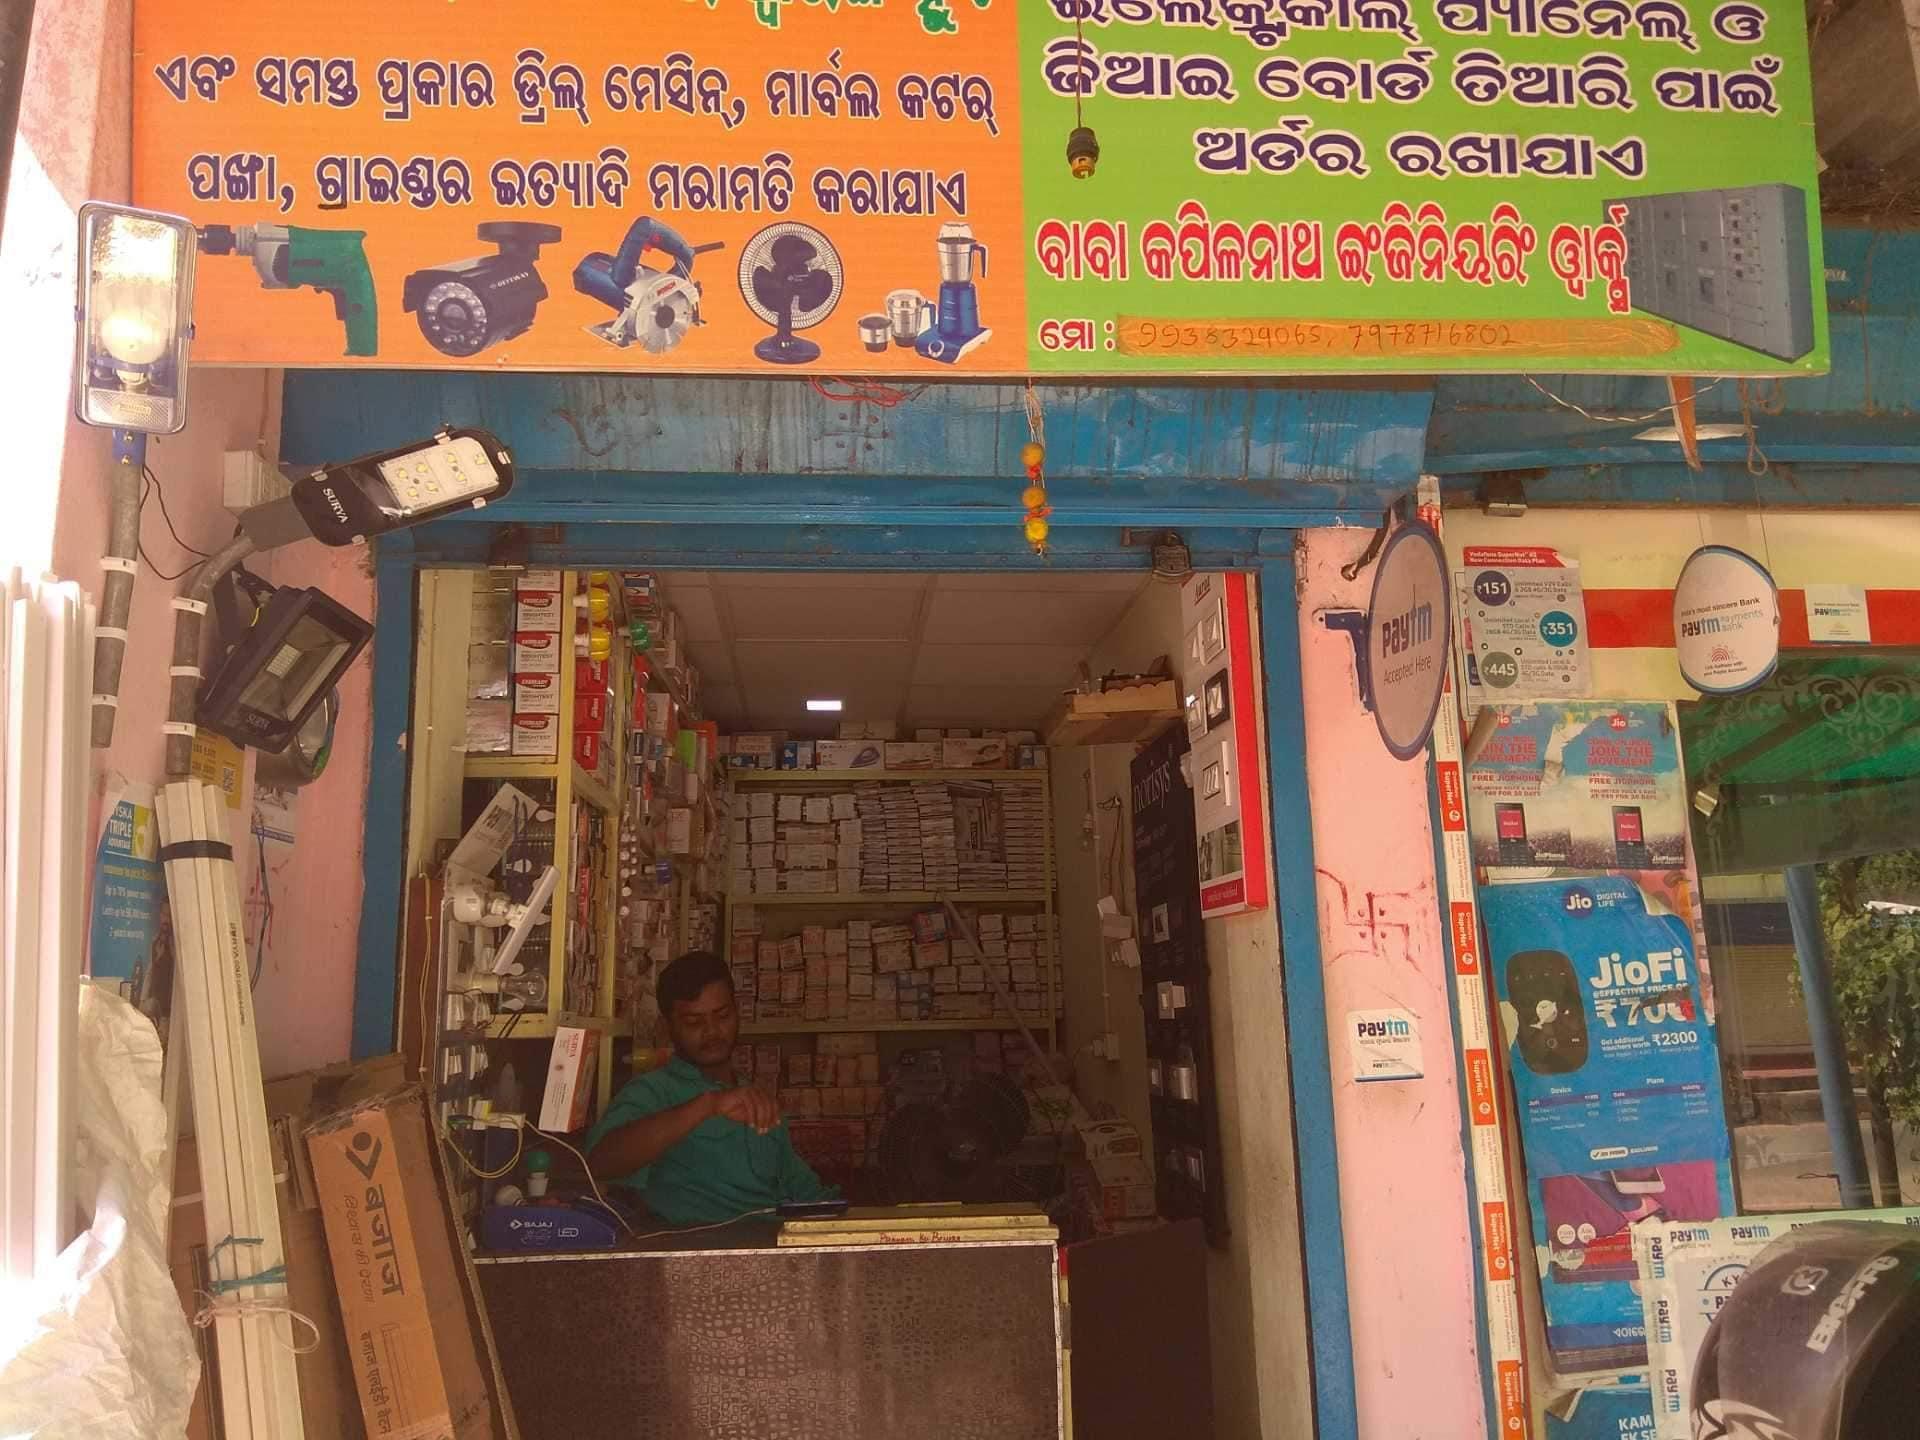 Awesome Top 10 Electricians Near Ravi Talkies Bhubaneswar Bhubaneshwar Wiring Cloud Nuvitbieswglorg